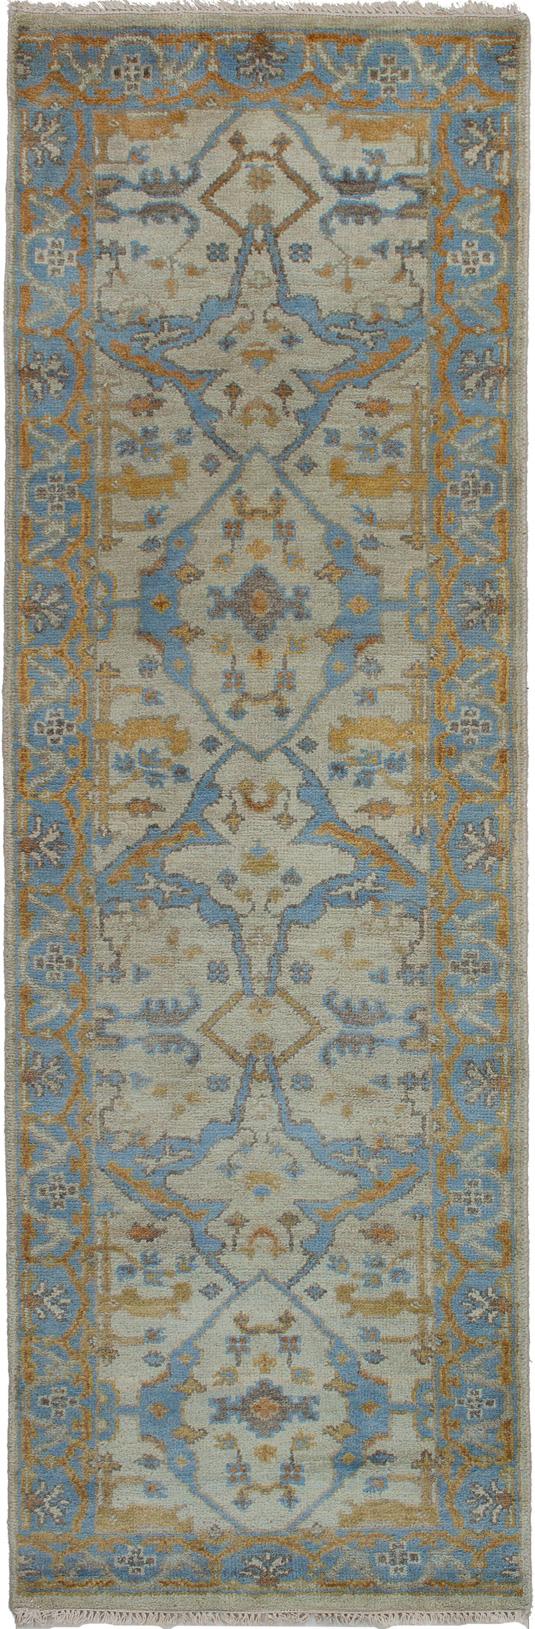 "Hand-knotted Royal Ushak Blue Wool Rug 2'8"" x 8'2"" Size: 2'8"" x 8'2"""